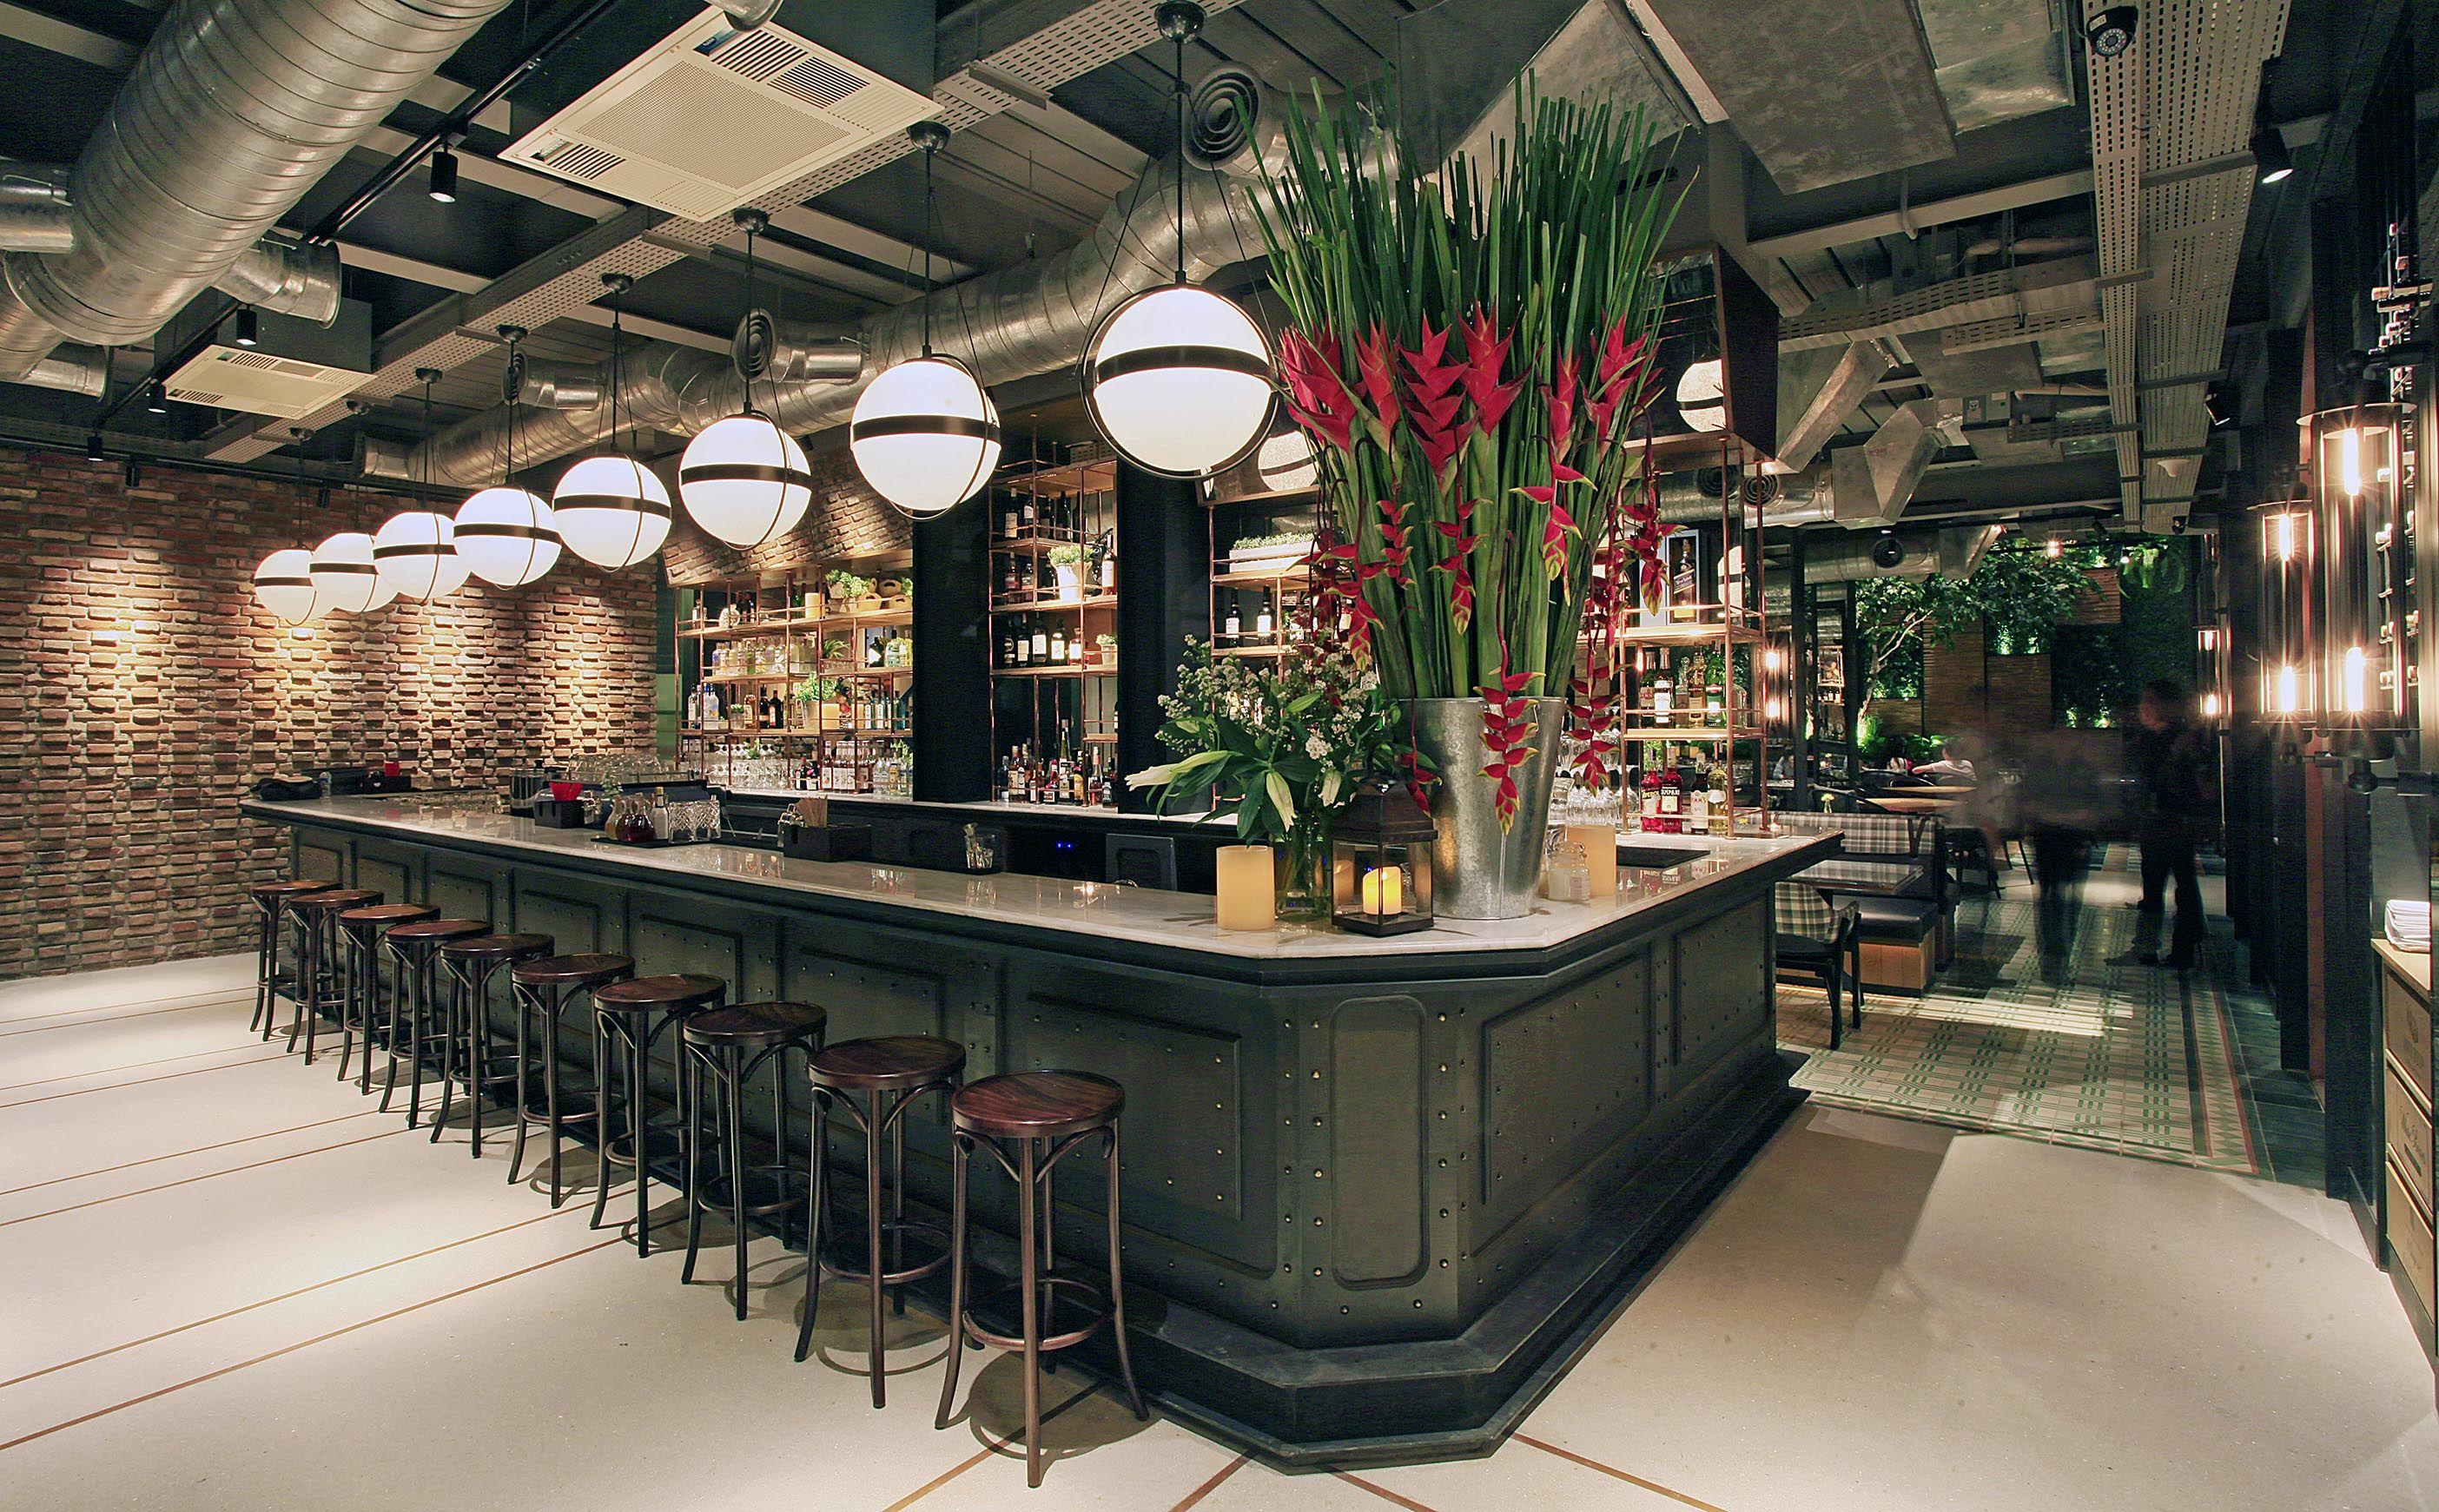 Hurricane S Grill At Gunawarman Jakarta Cafe Interior Design Retail Interior Design Hospitality And Interior Architecture